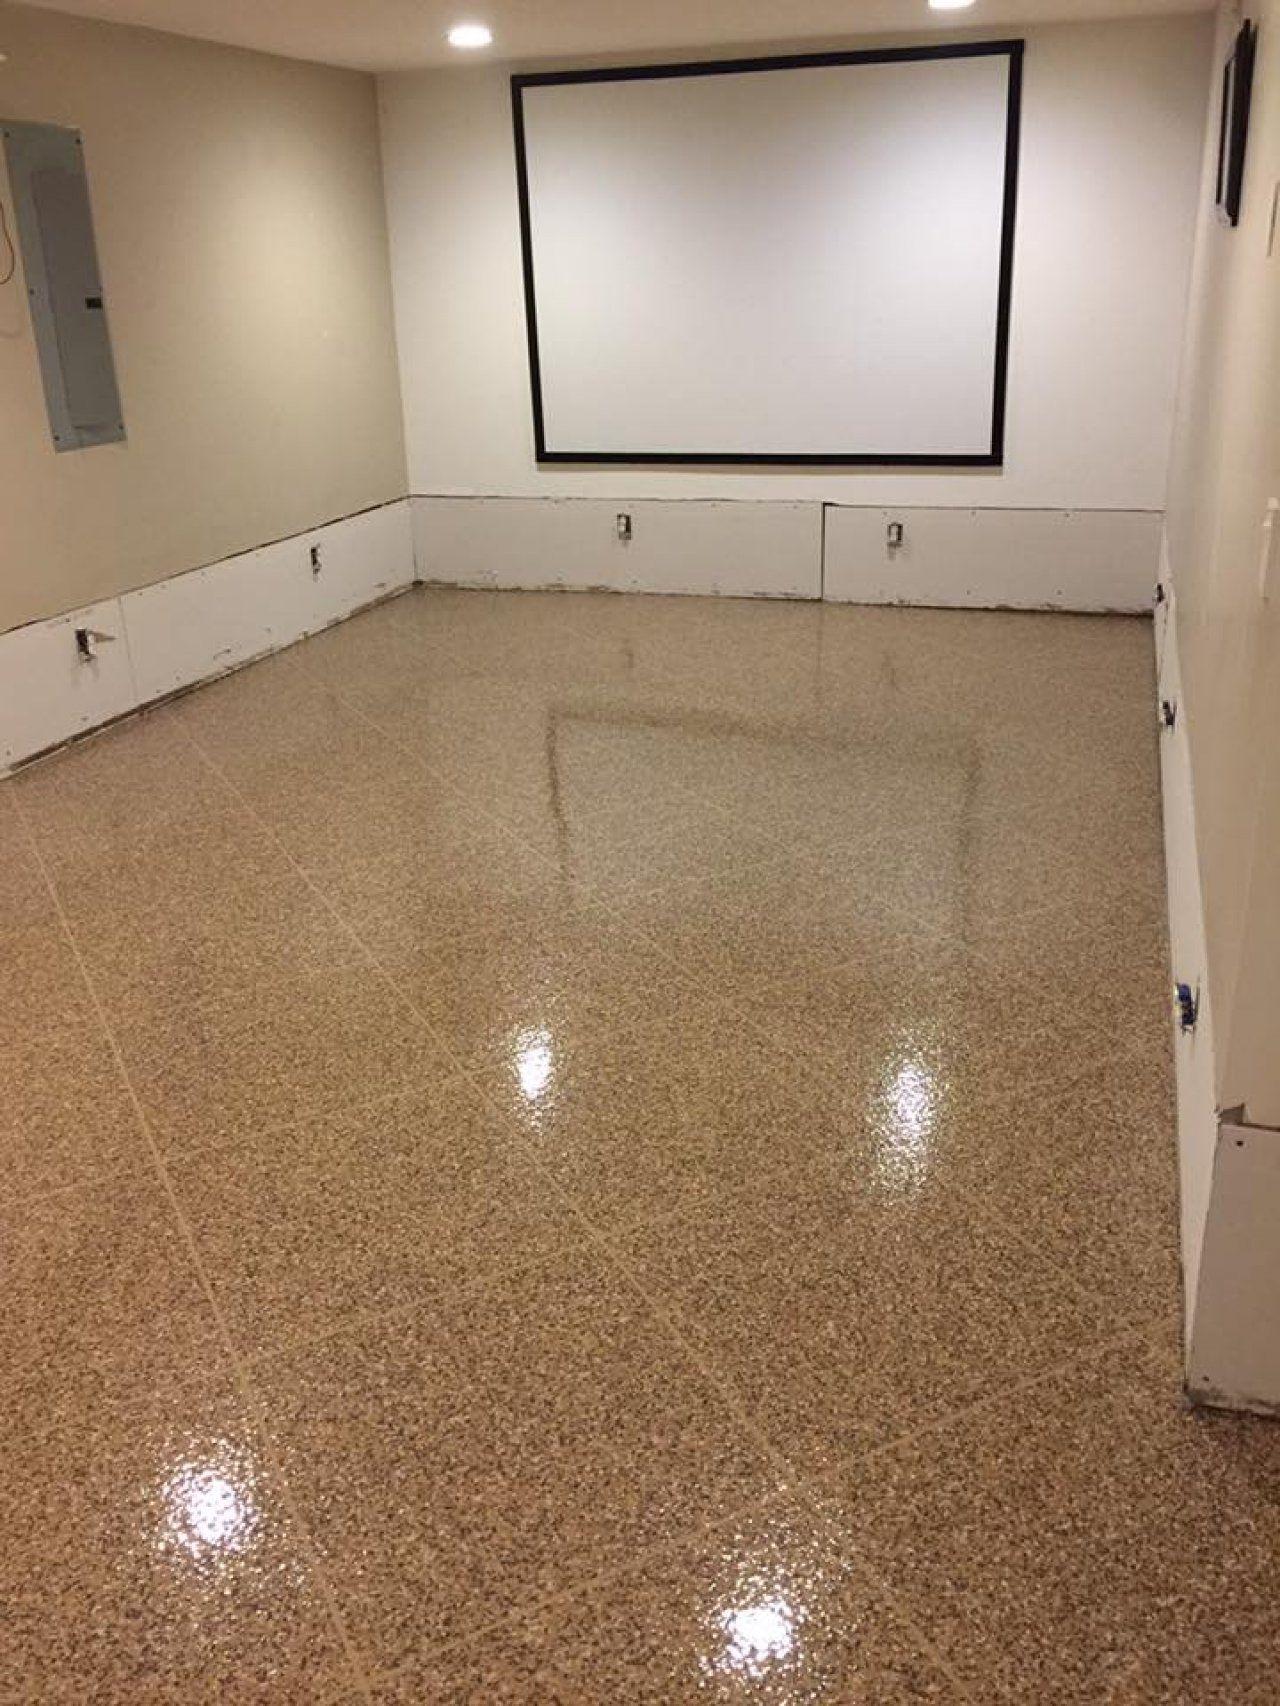 epoxy tile flake basement in findlay ohio ohio decorative rh pinterest com